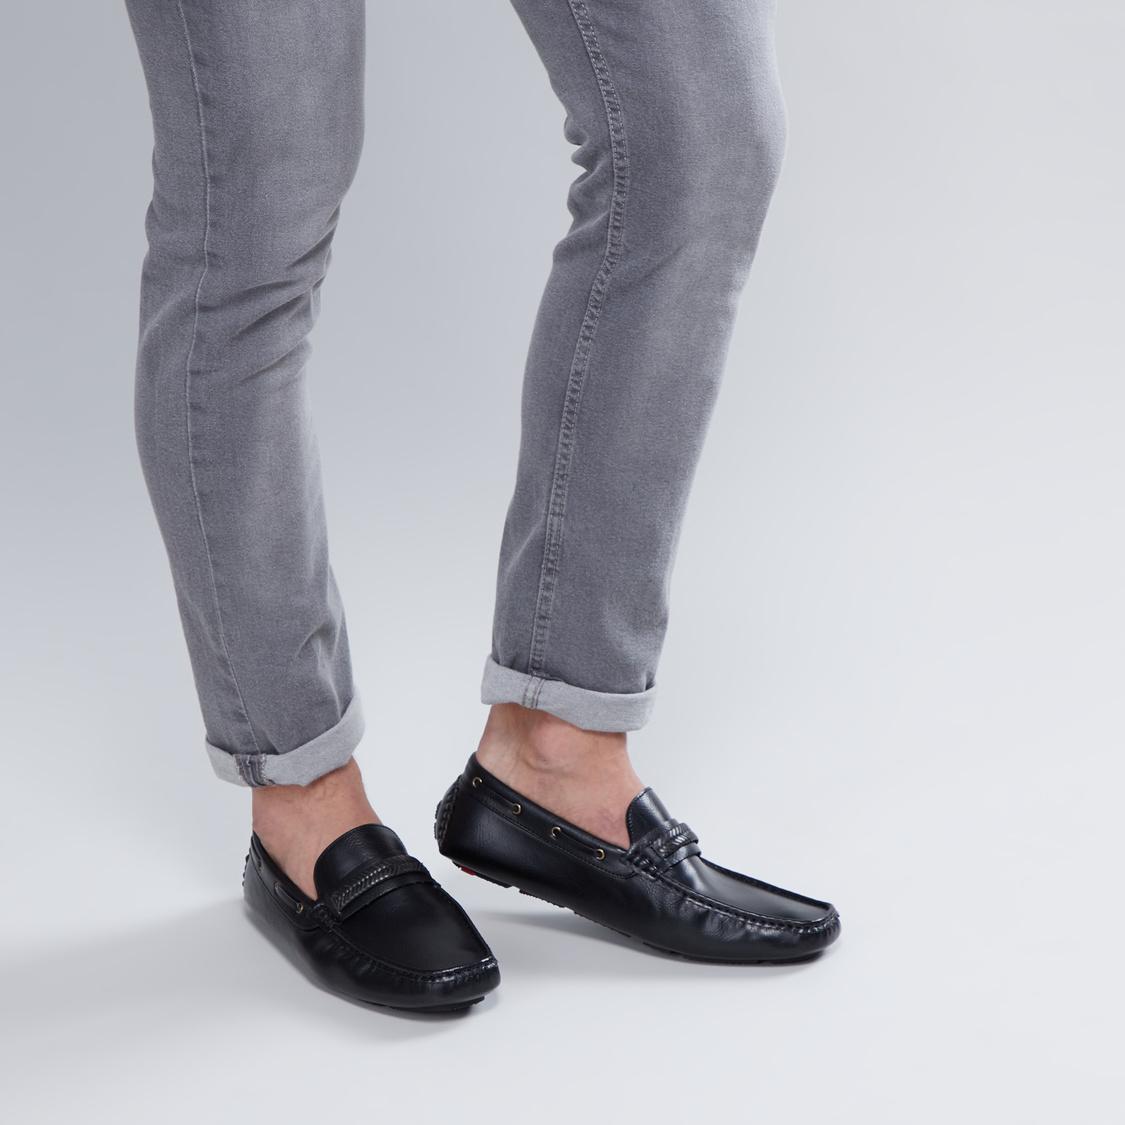 Stitch Detail Slip-On Mocassin Shoes